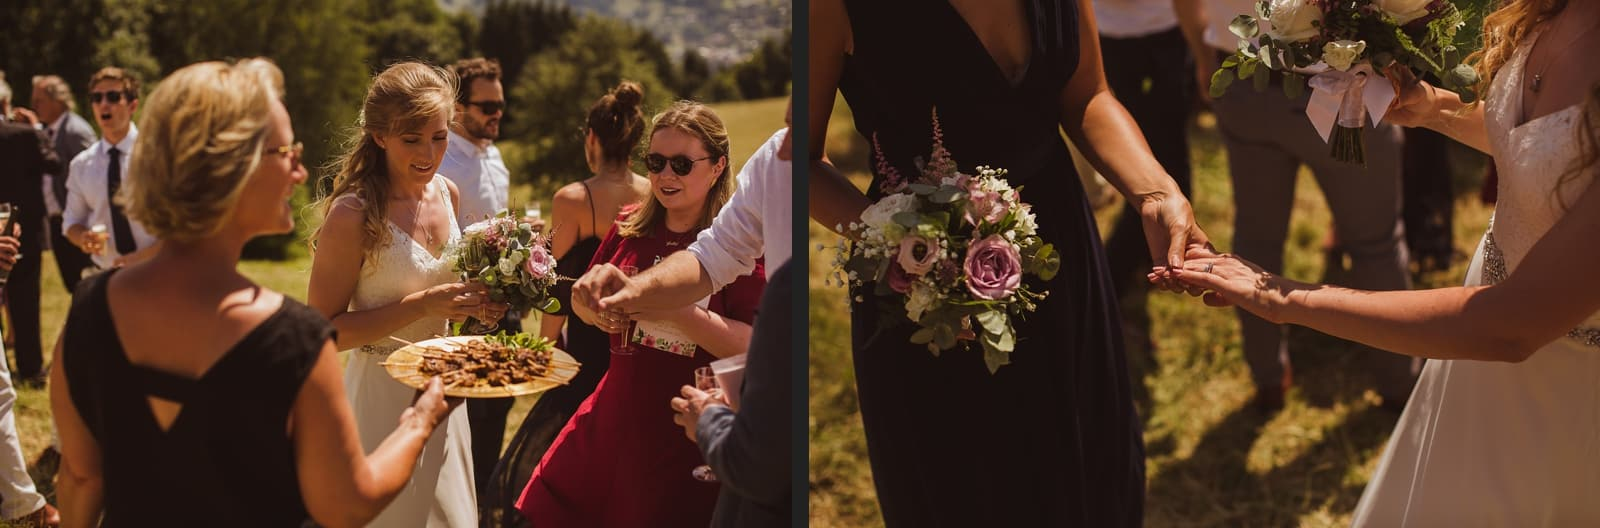 Wedding Photographer France 0027